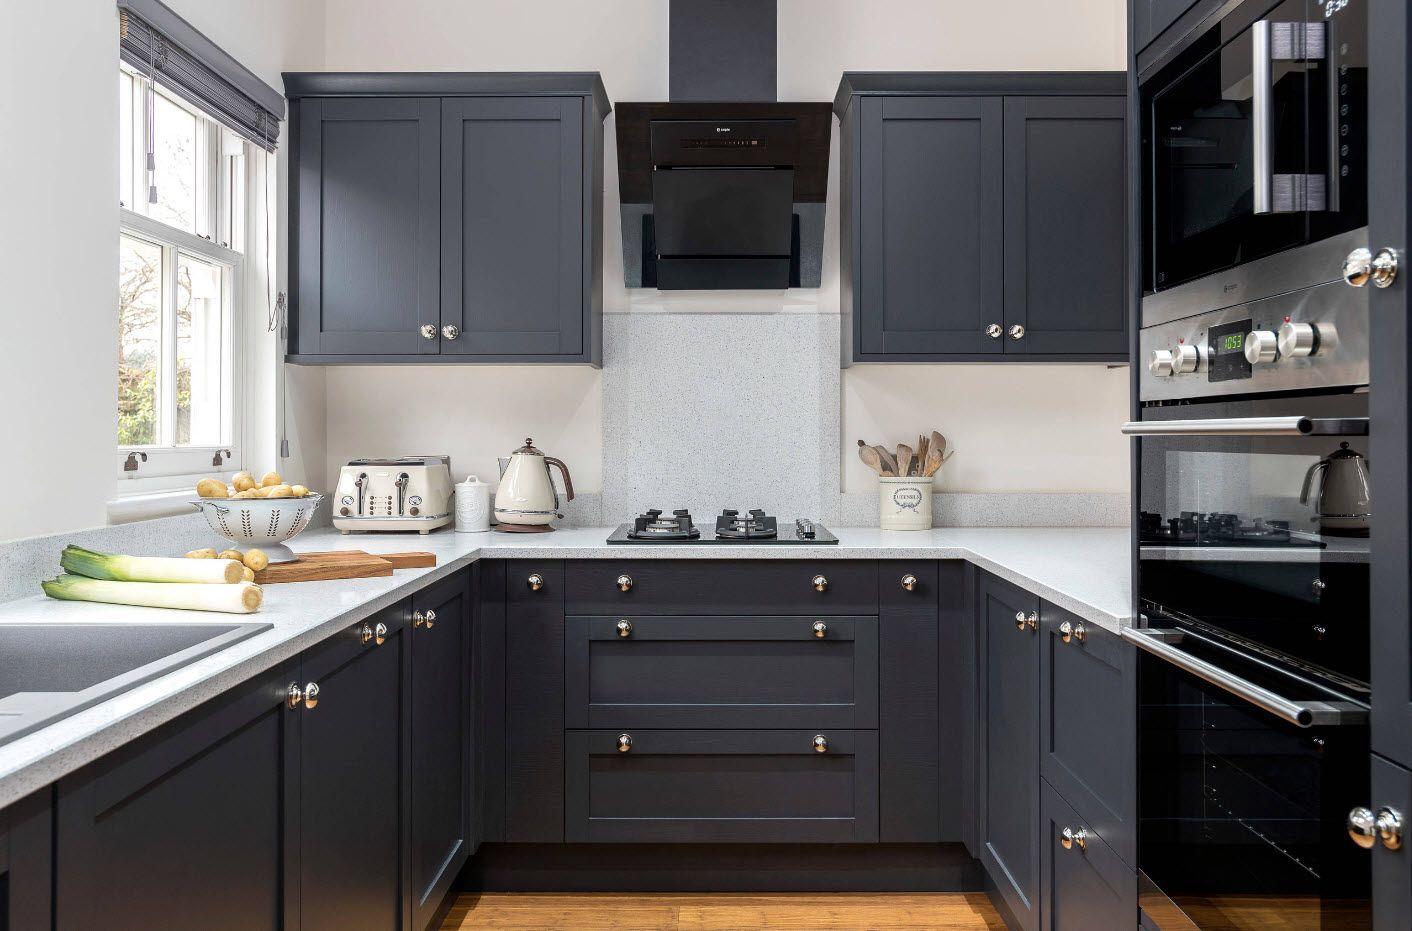 Dark wooden kitchen furniture set with gold handles looks spectacular